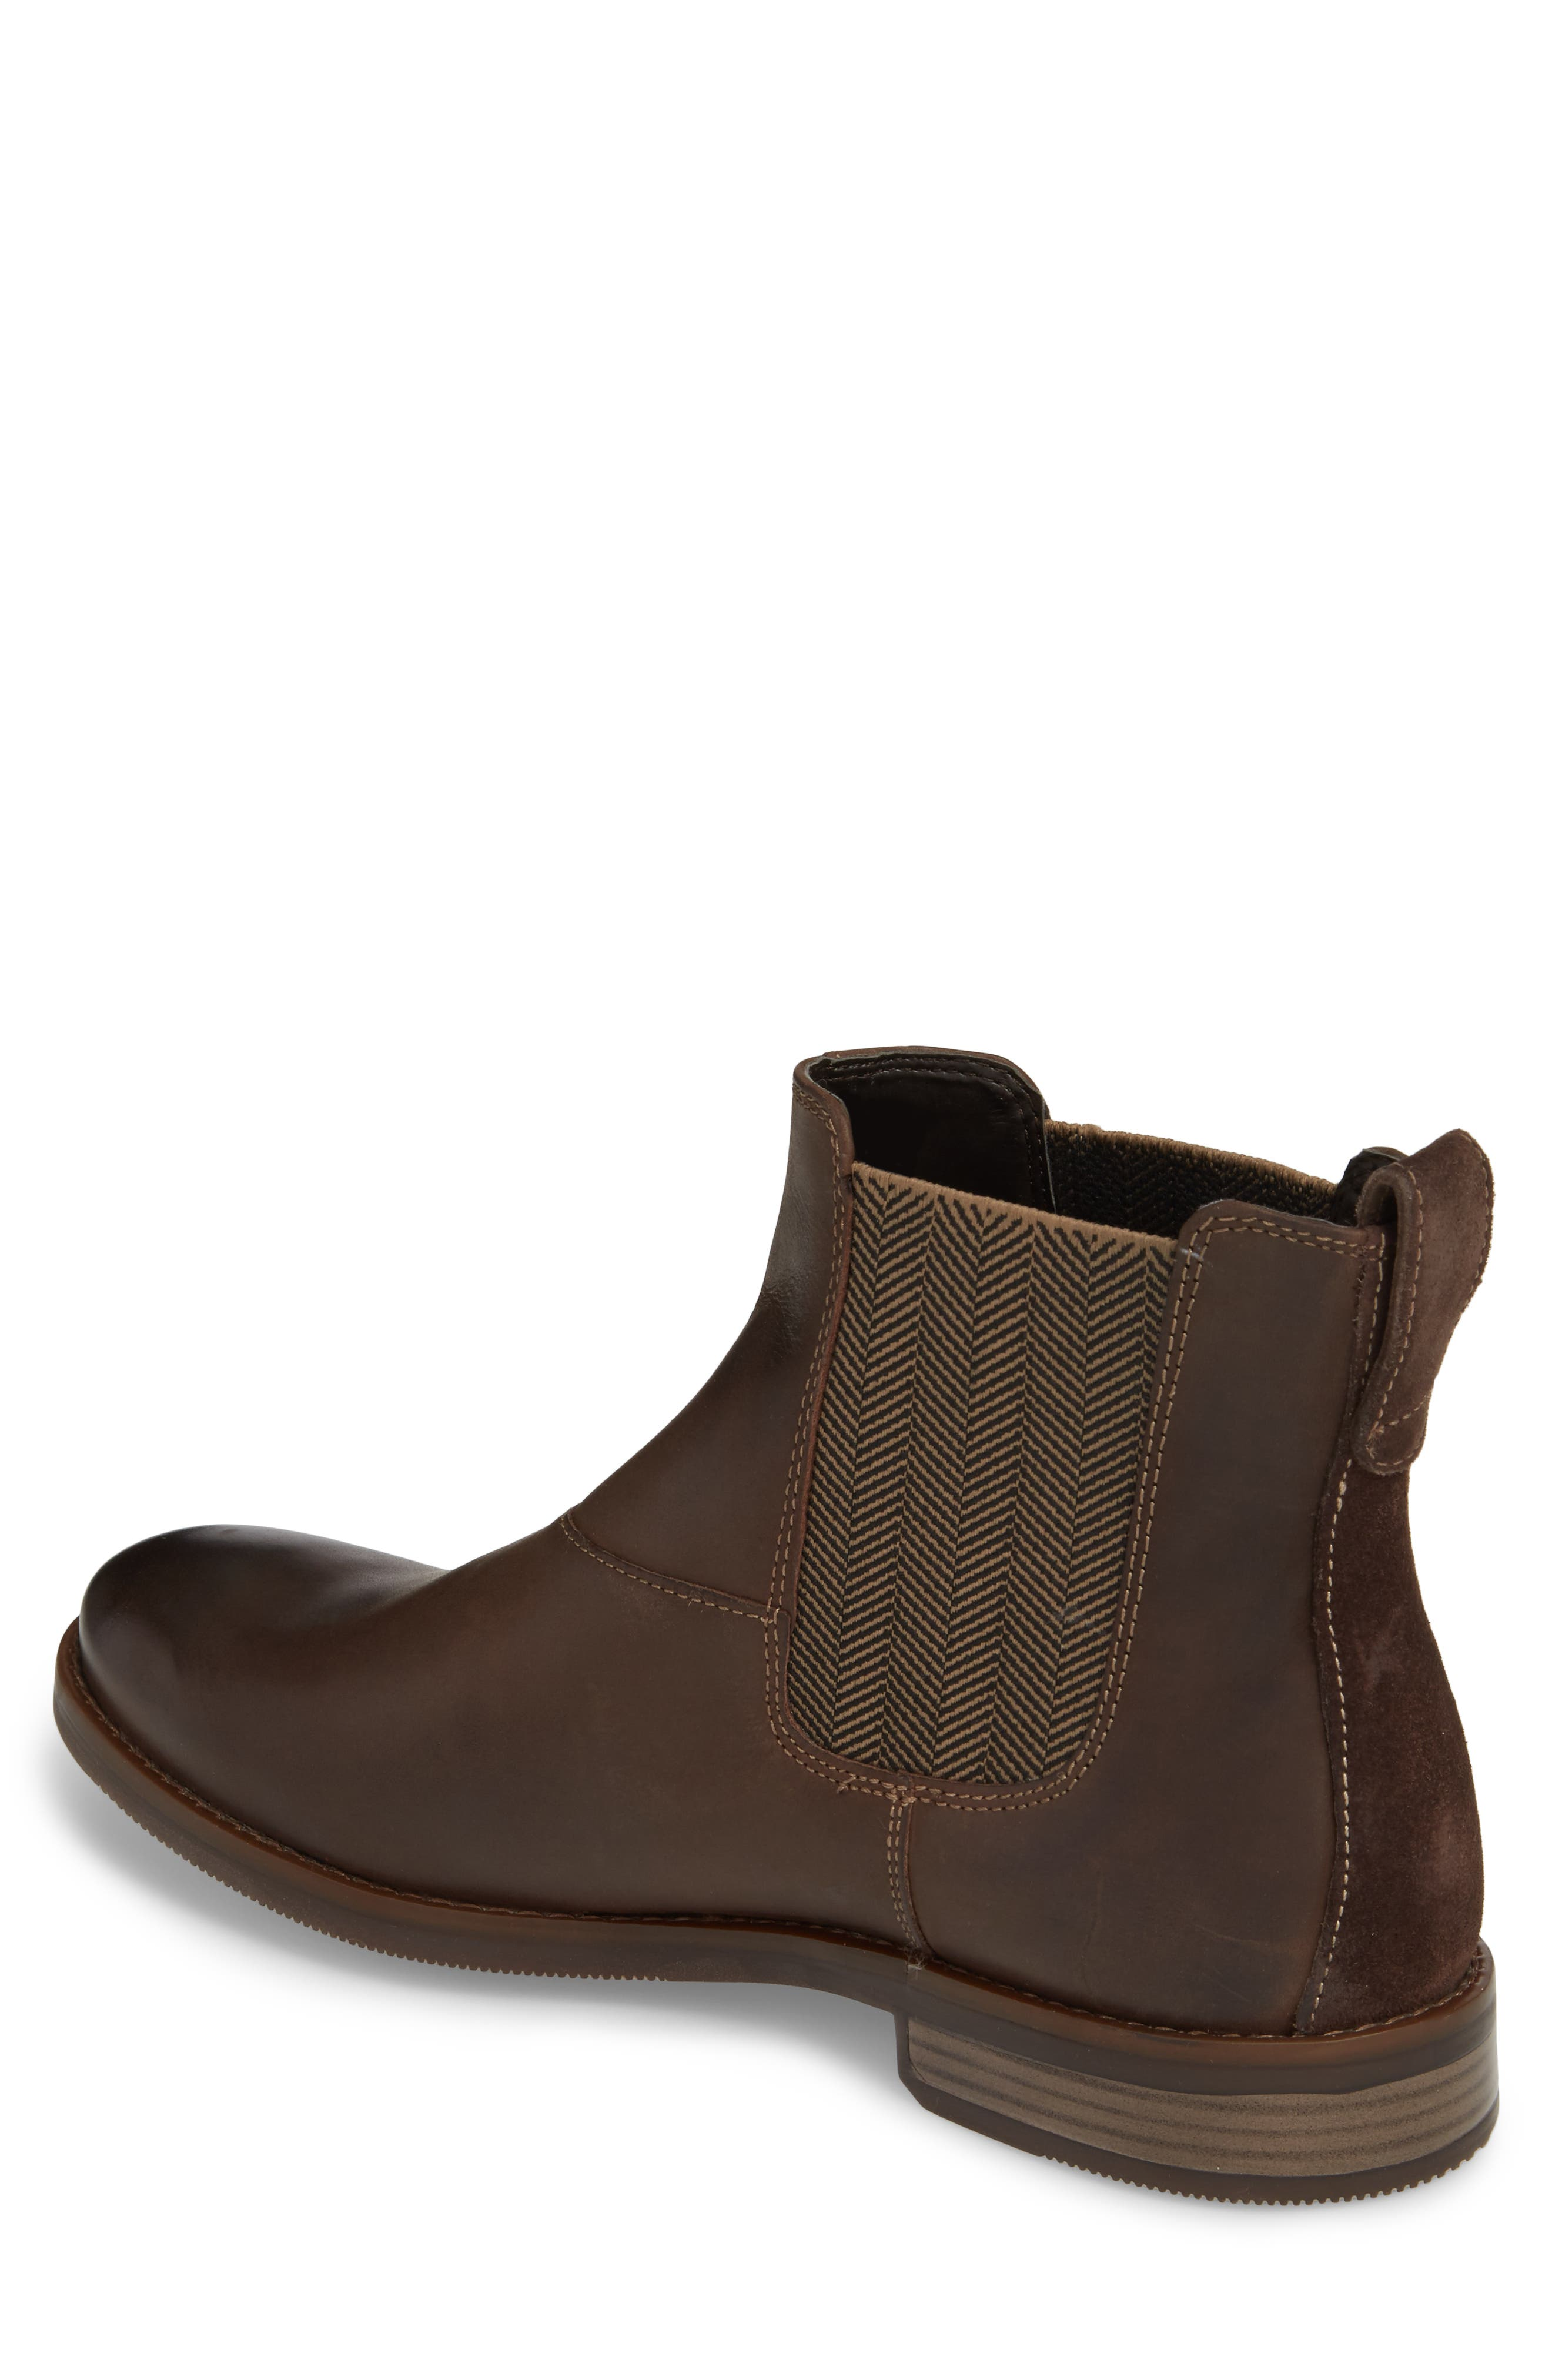 Wynstin Chelsea Boot,                             Alternate thumbnail 2, color,                             Dark Bitter Chocolate Leather